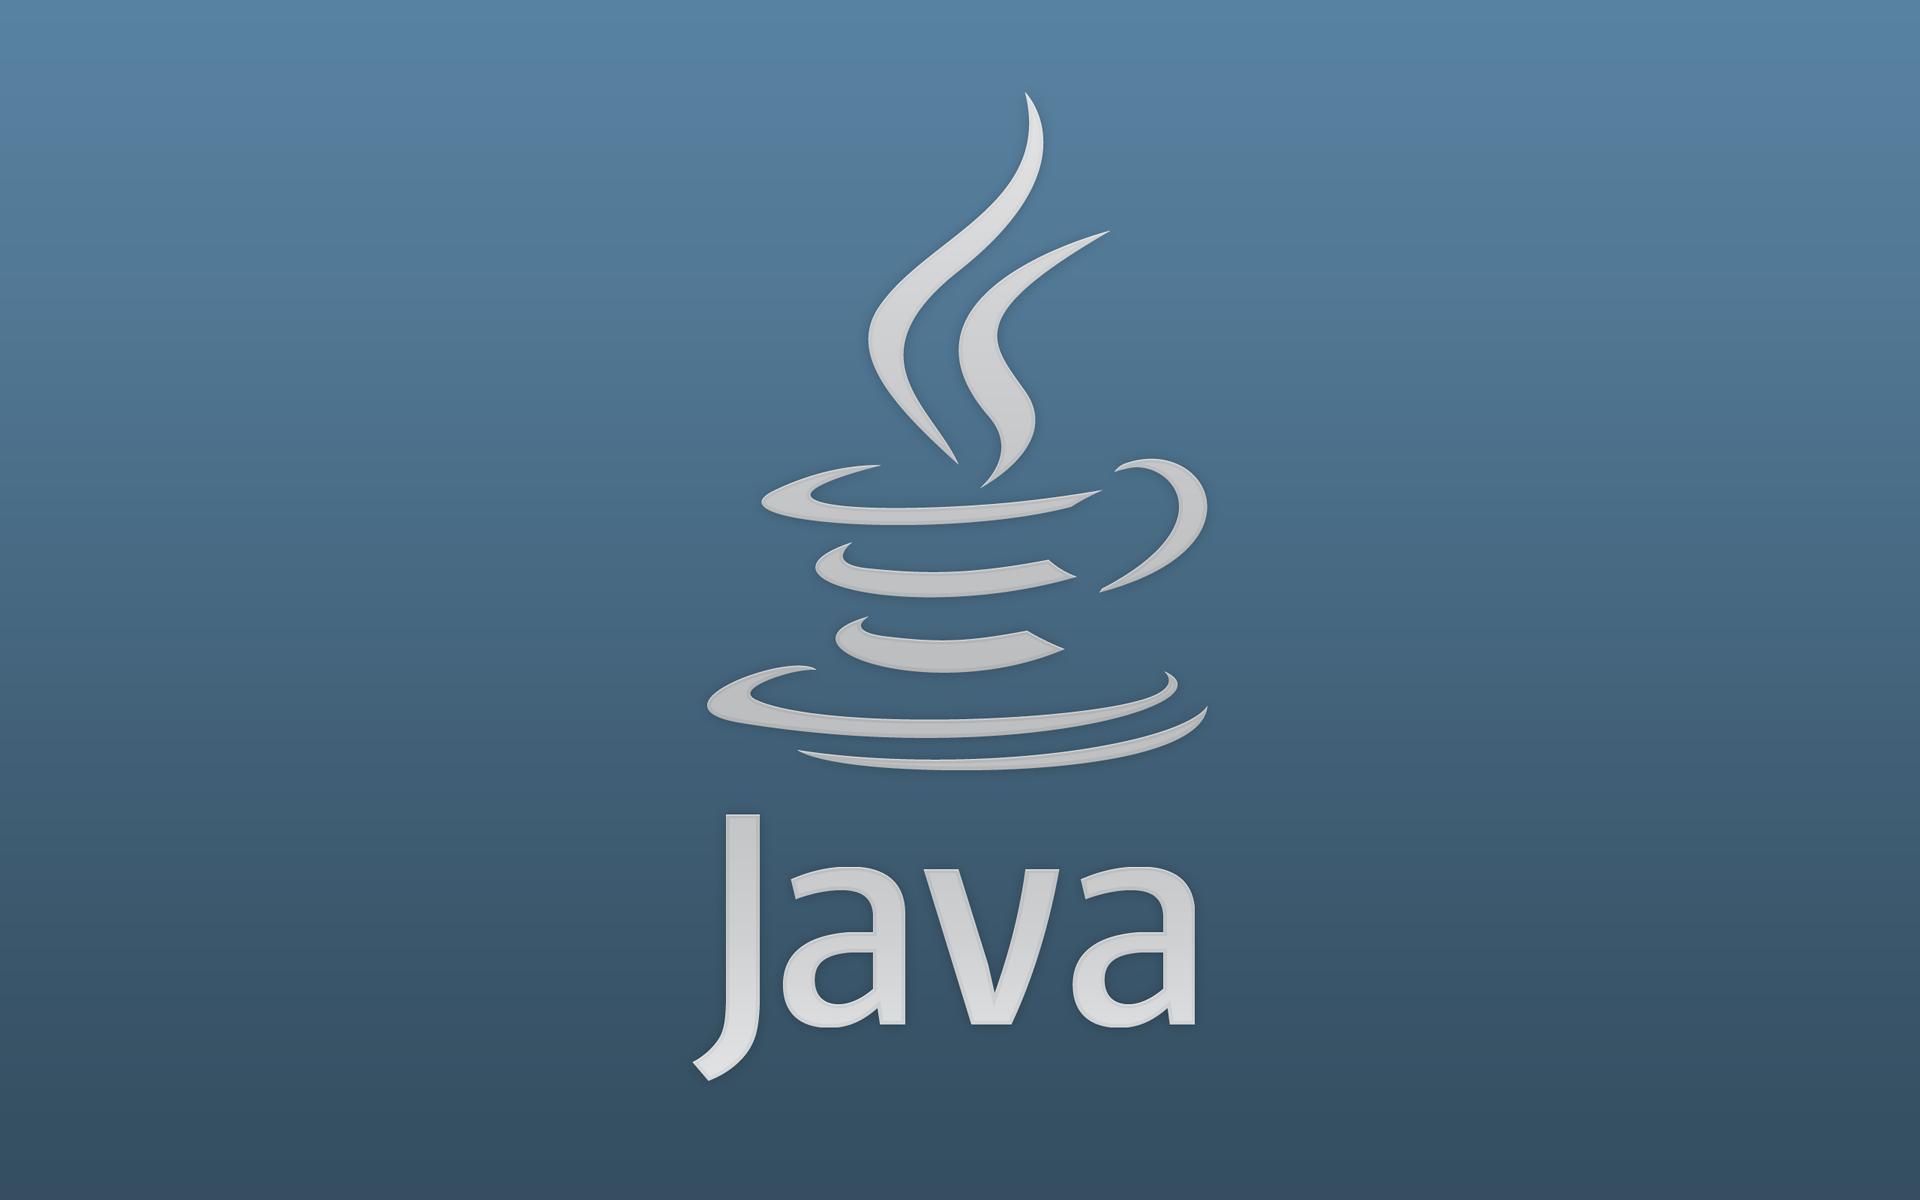 Java Logo Wallpaper Java Library Java Java Programming